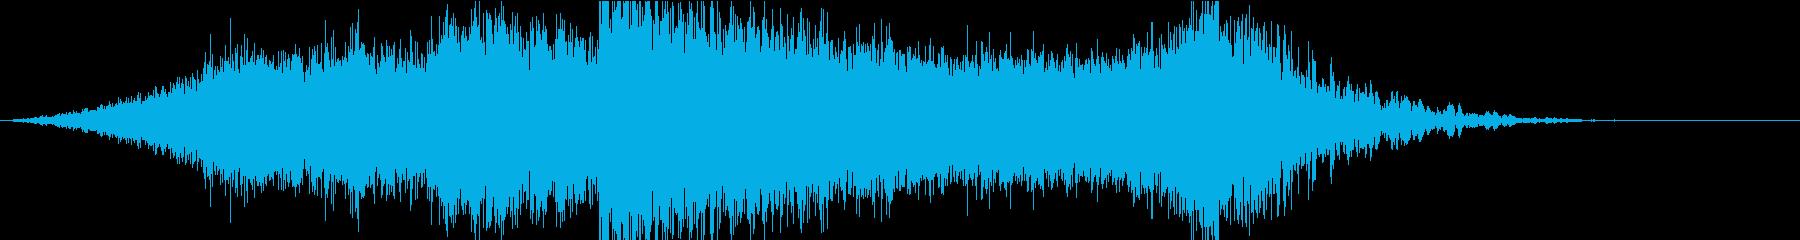 Cinema trailer 1 MIDDLE_L's reproduced waveform